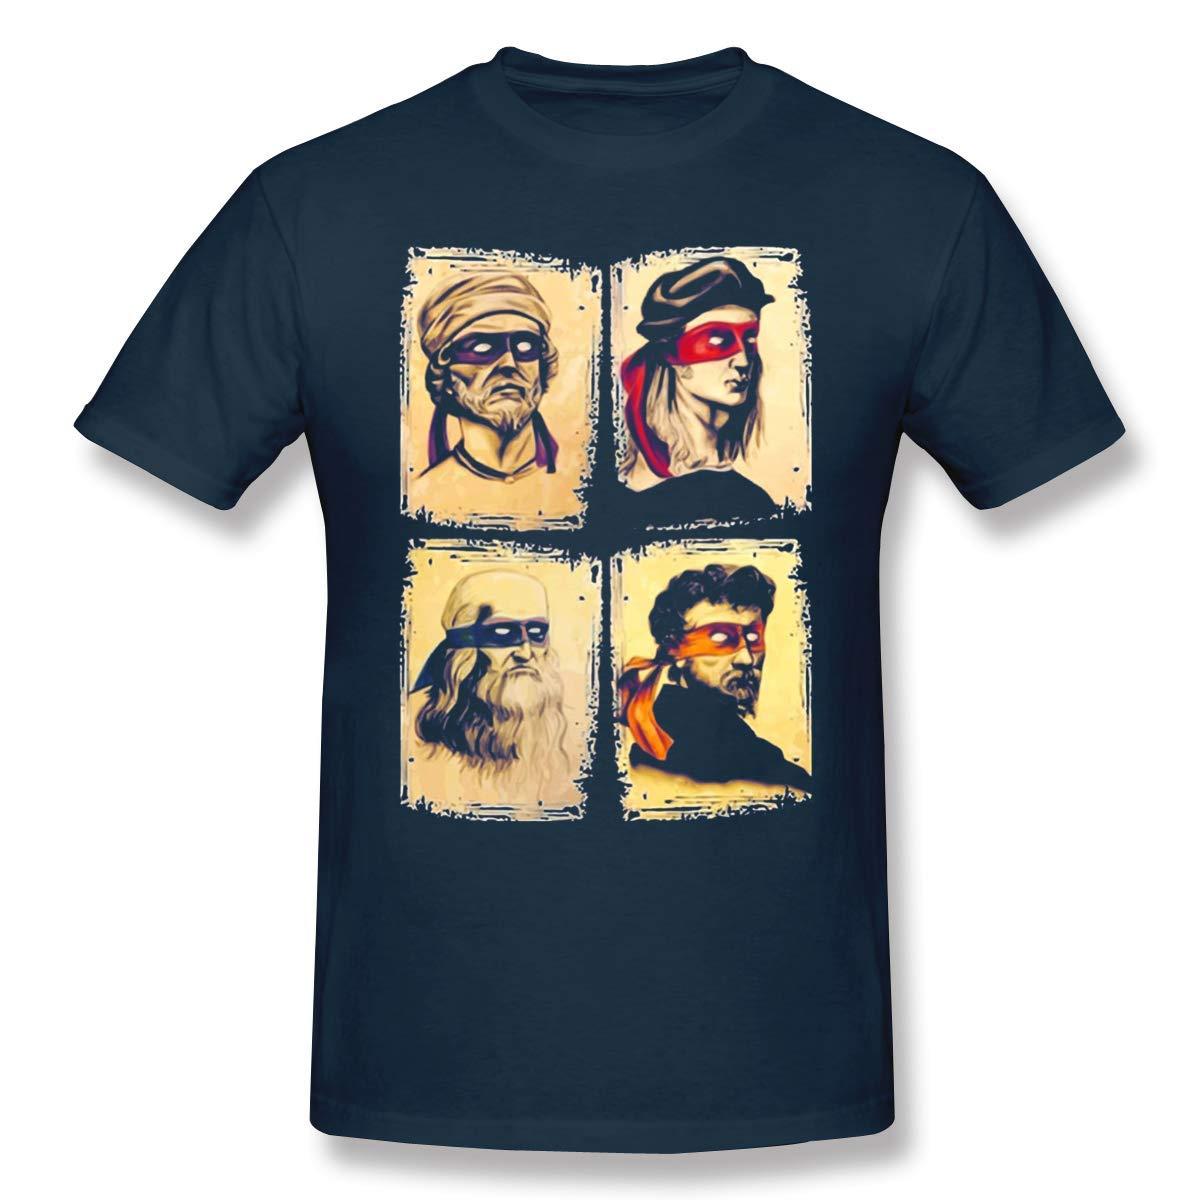 As Real Masters Science Printed Design Fashion Short Sleeve Shirts